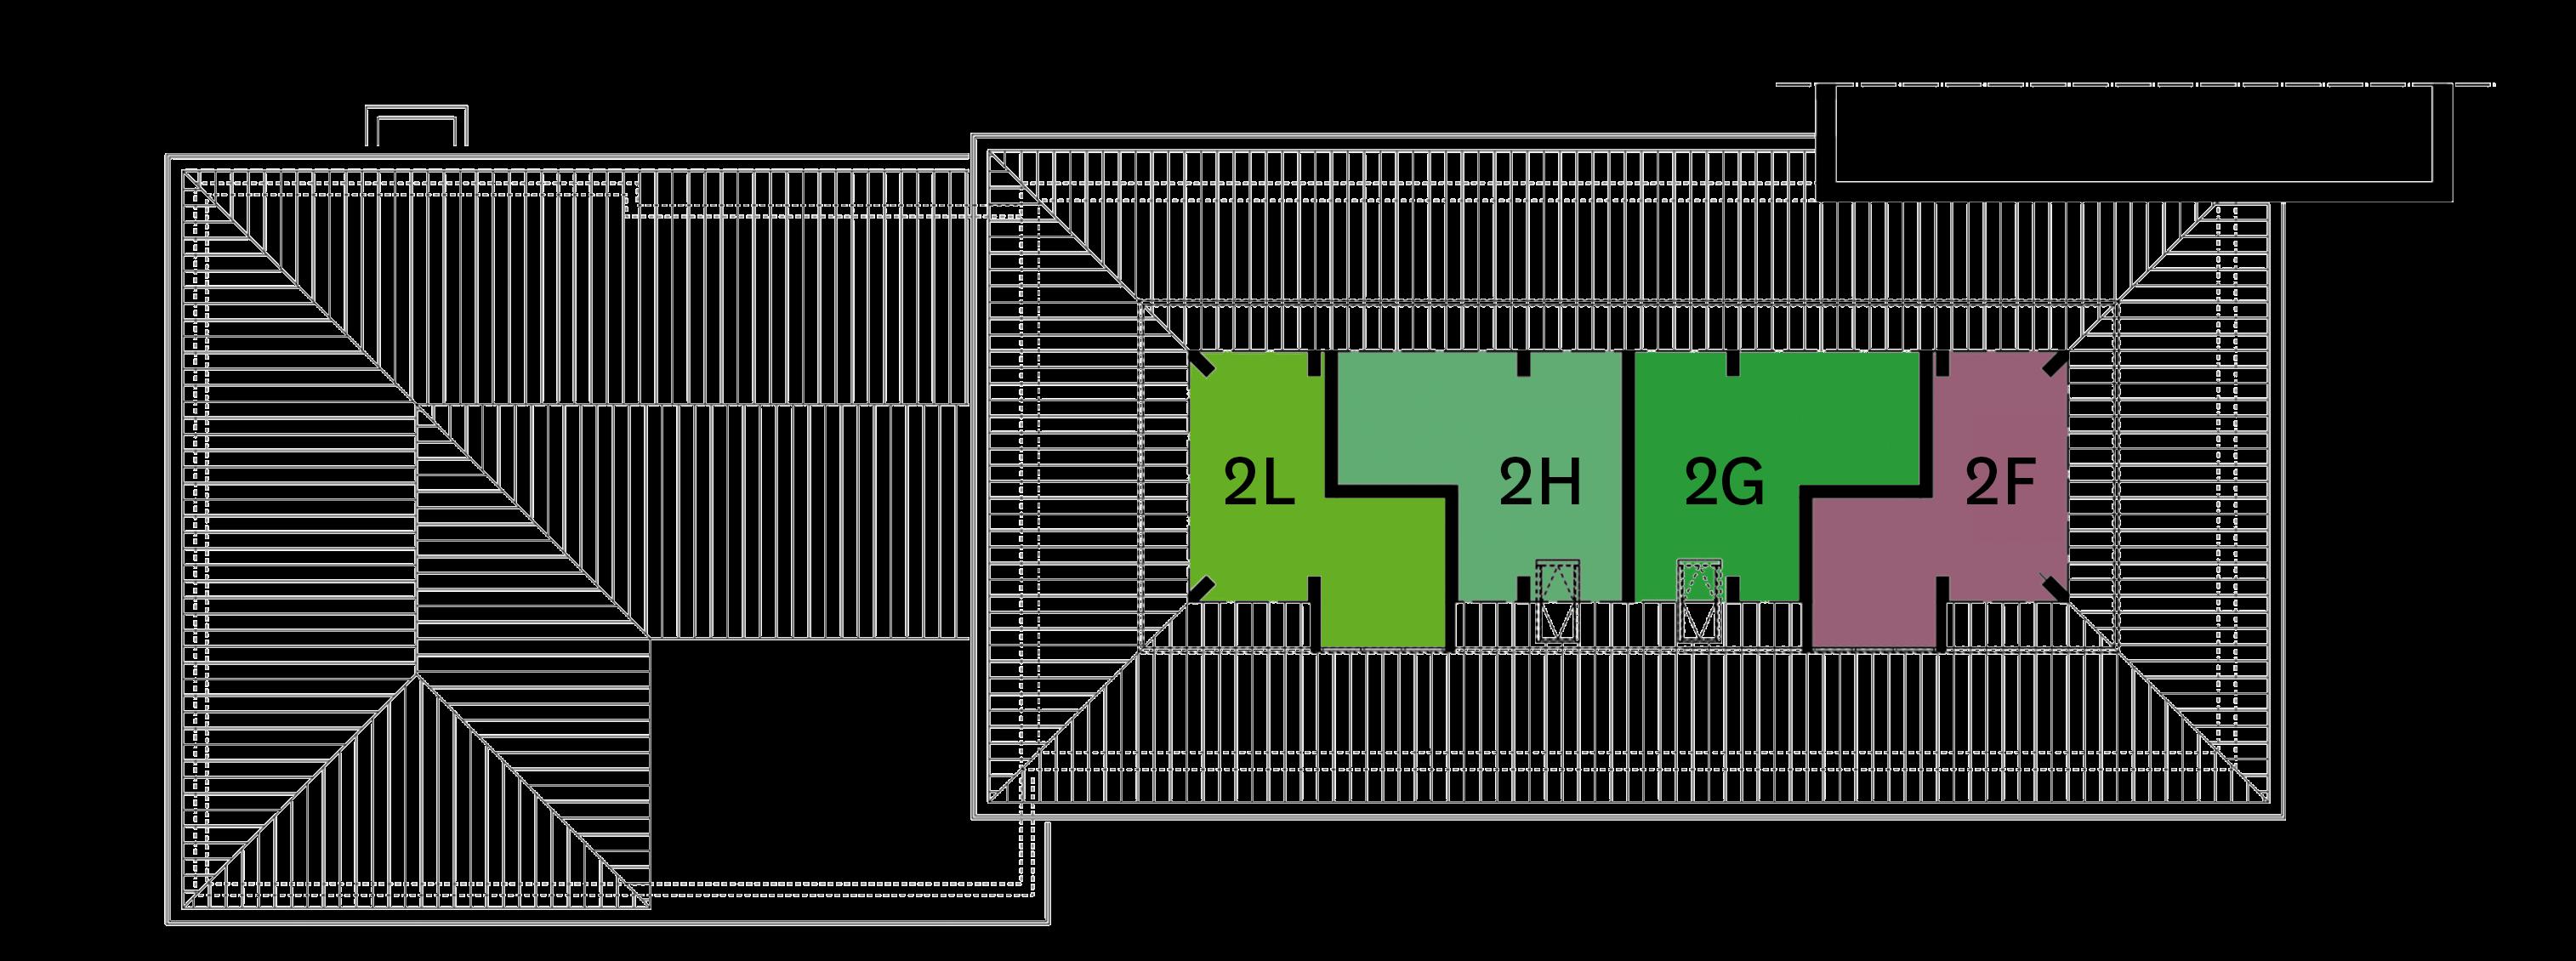 2e verdieping fase 5 plattegrond